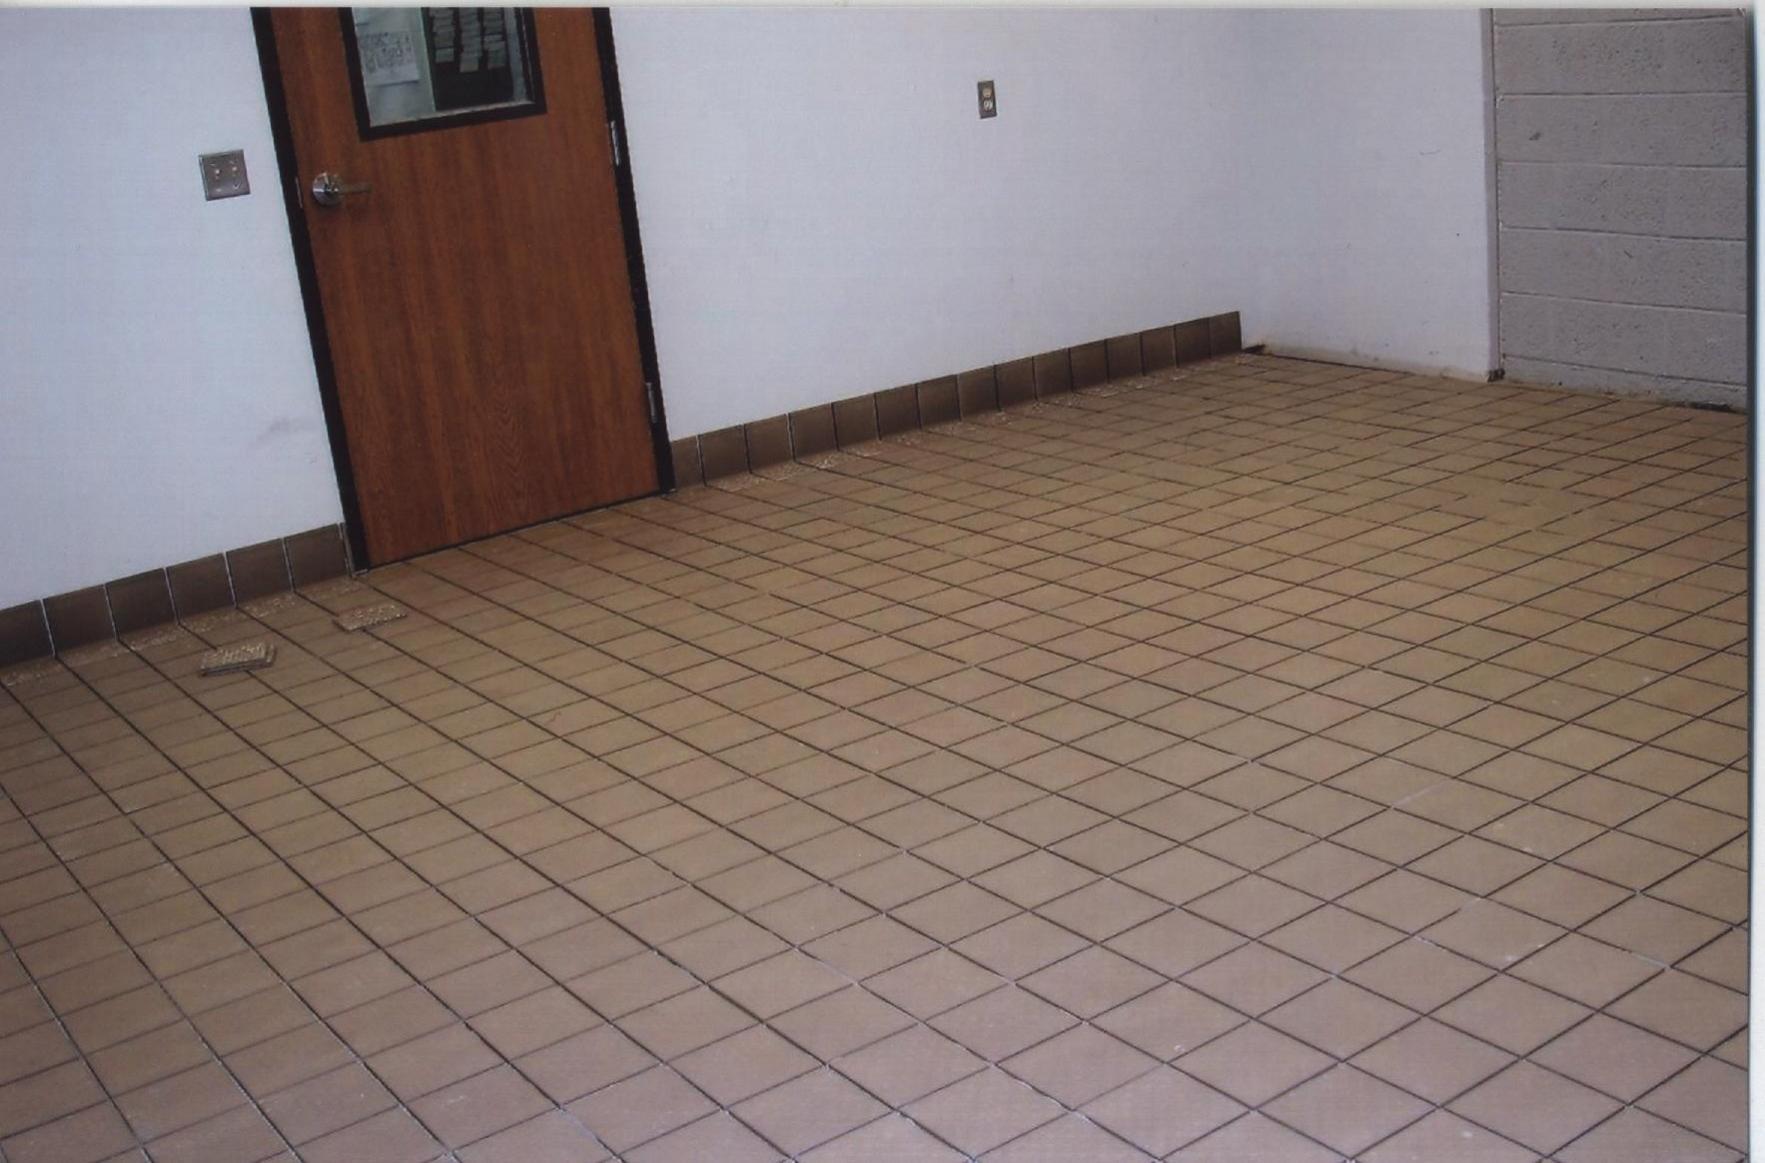 restaurant kitchen floor flooring contractor talk. Black Bedroom Furniture Sets. Home Design Ideas